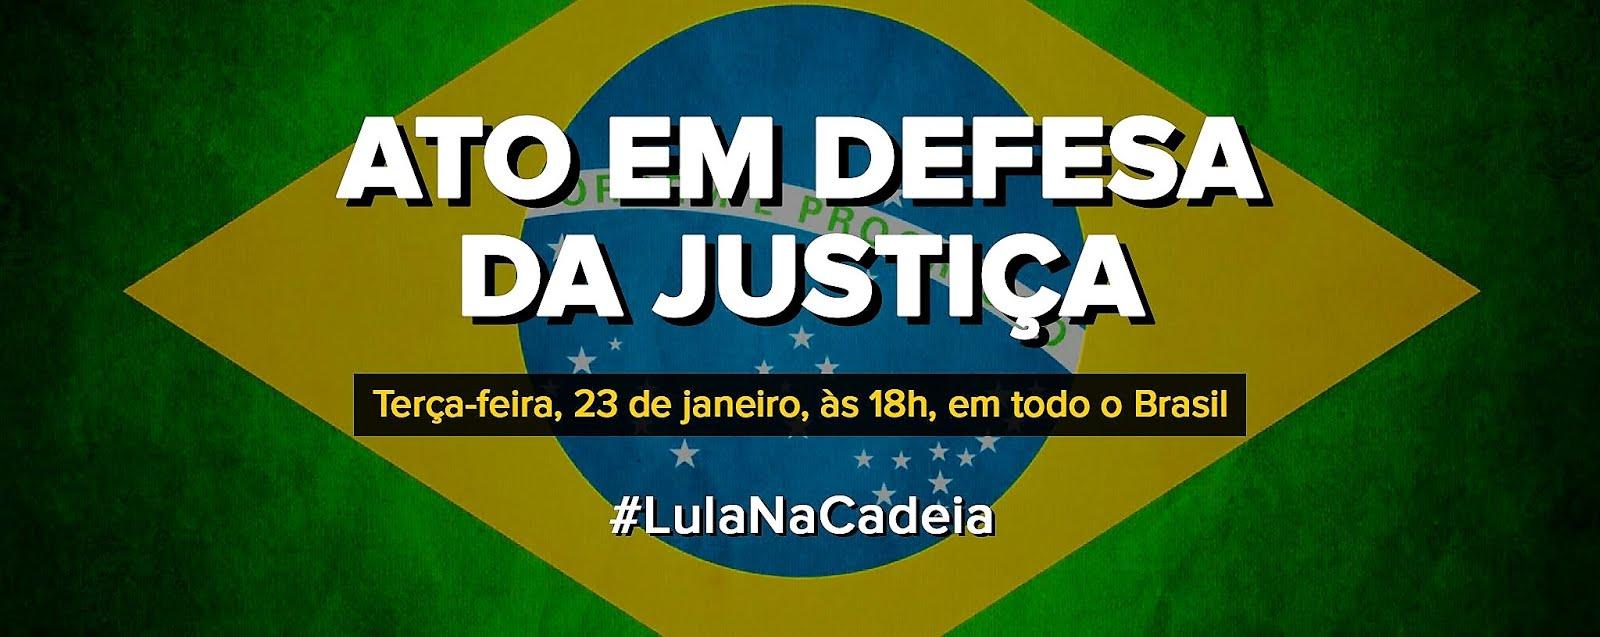 23 de janeiro, 18h: Brasil